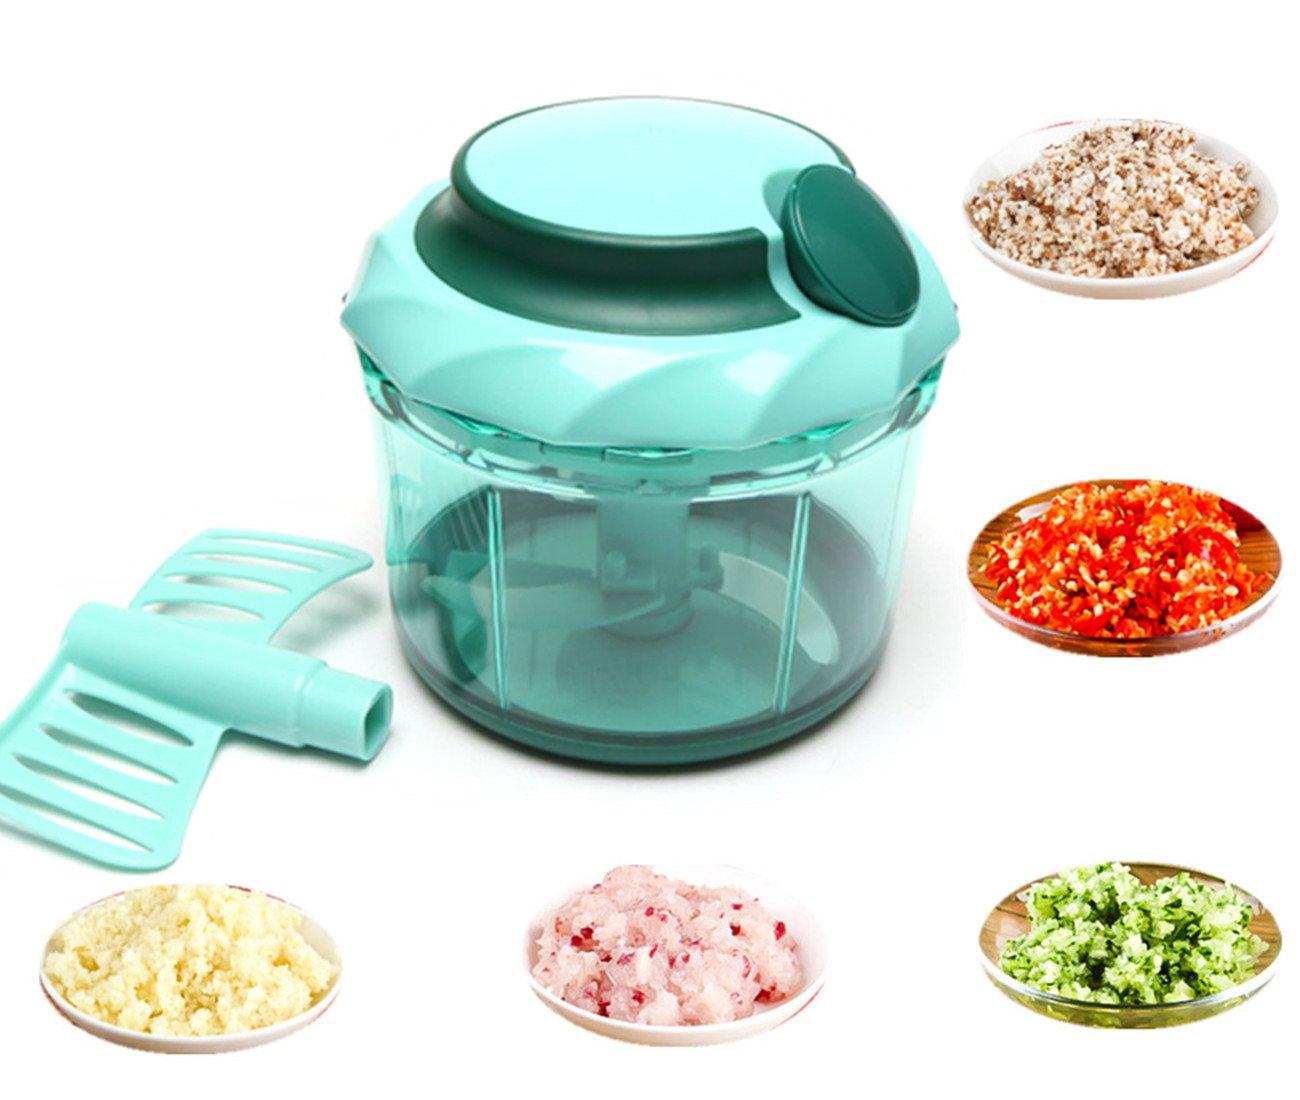 Amazon.com: Edofiy Manual Food Chopper/Blender/Mincer/Mixer For ...